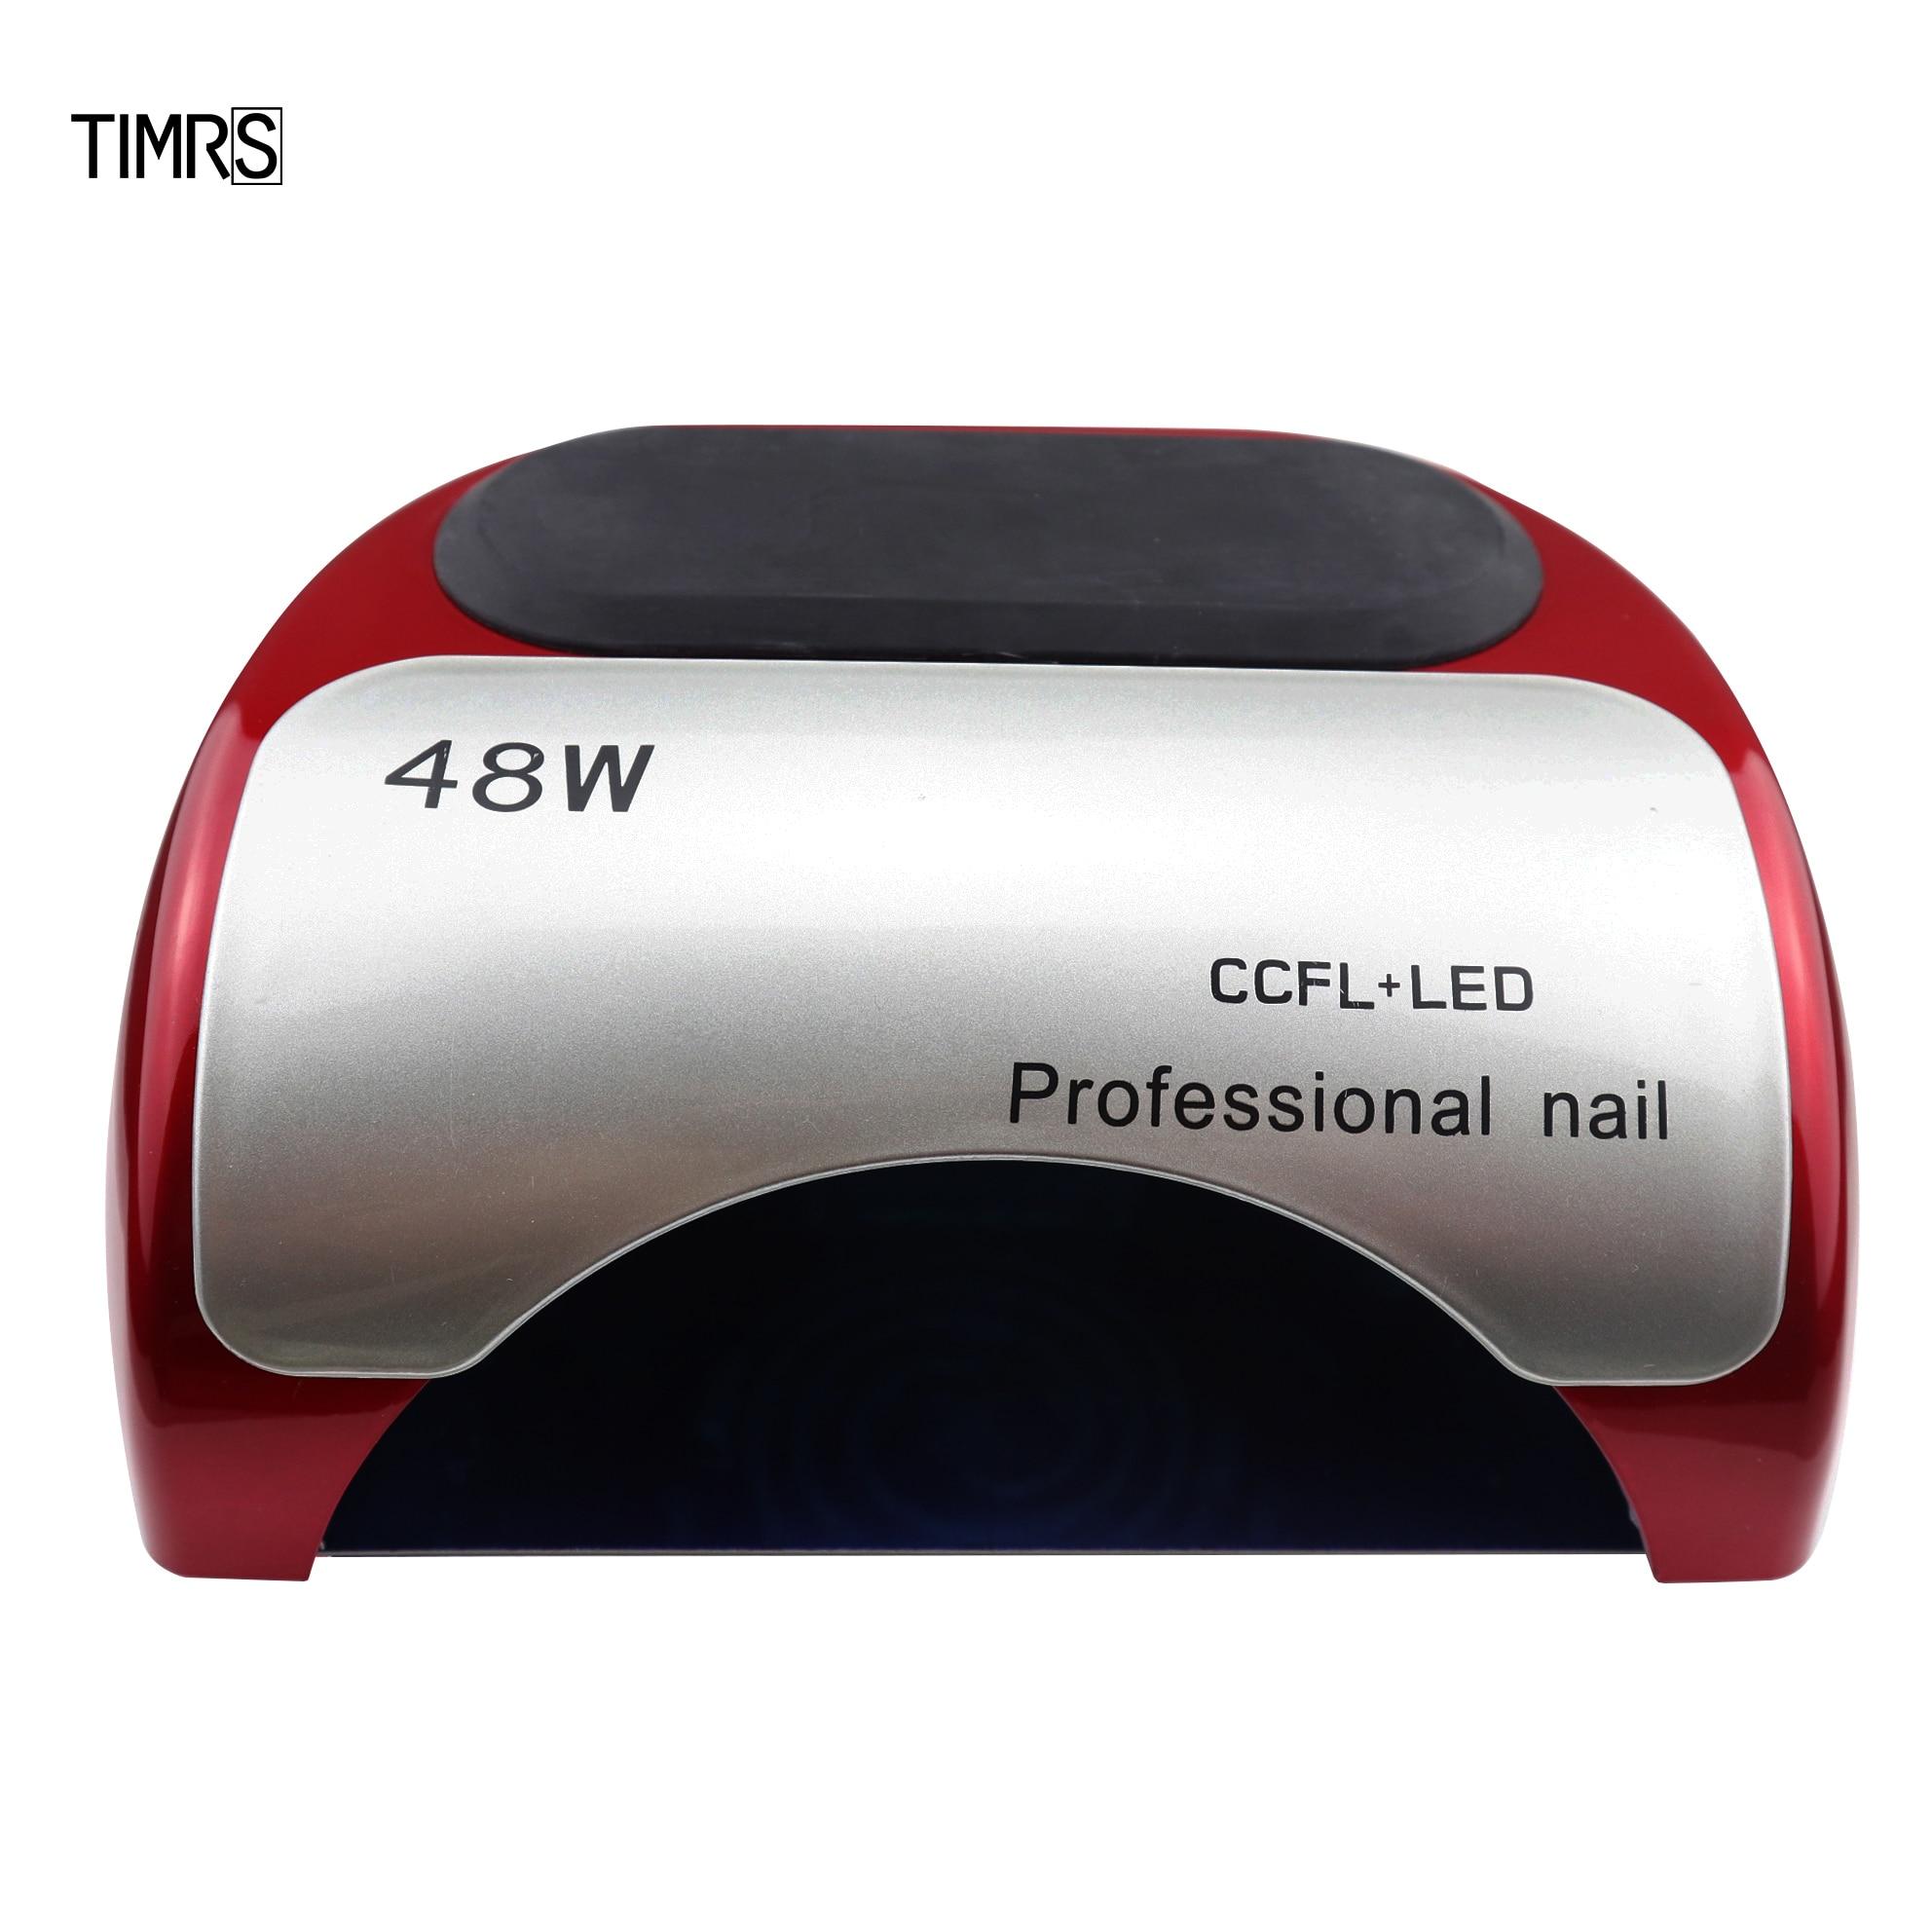 48W CCFL Led Lamp For Manicure Nails Dryer Nail Lamp Ice Lamp Hybrid Gel Curing UV Light For Gel Nails Regular Polish Dryer